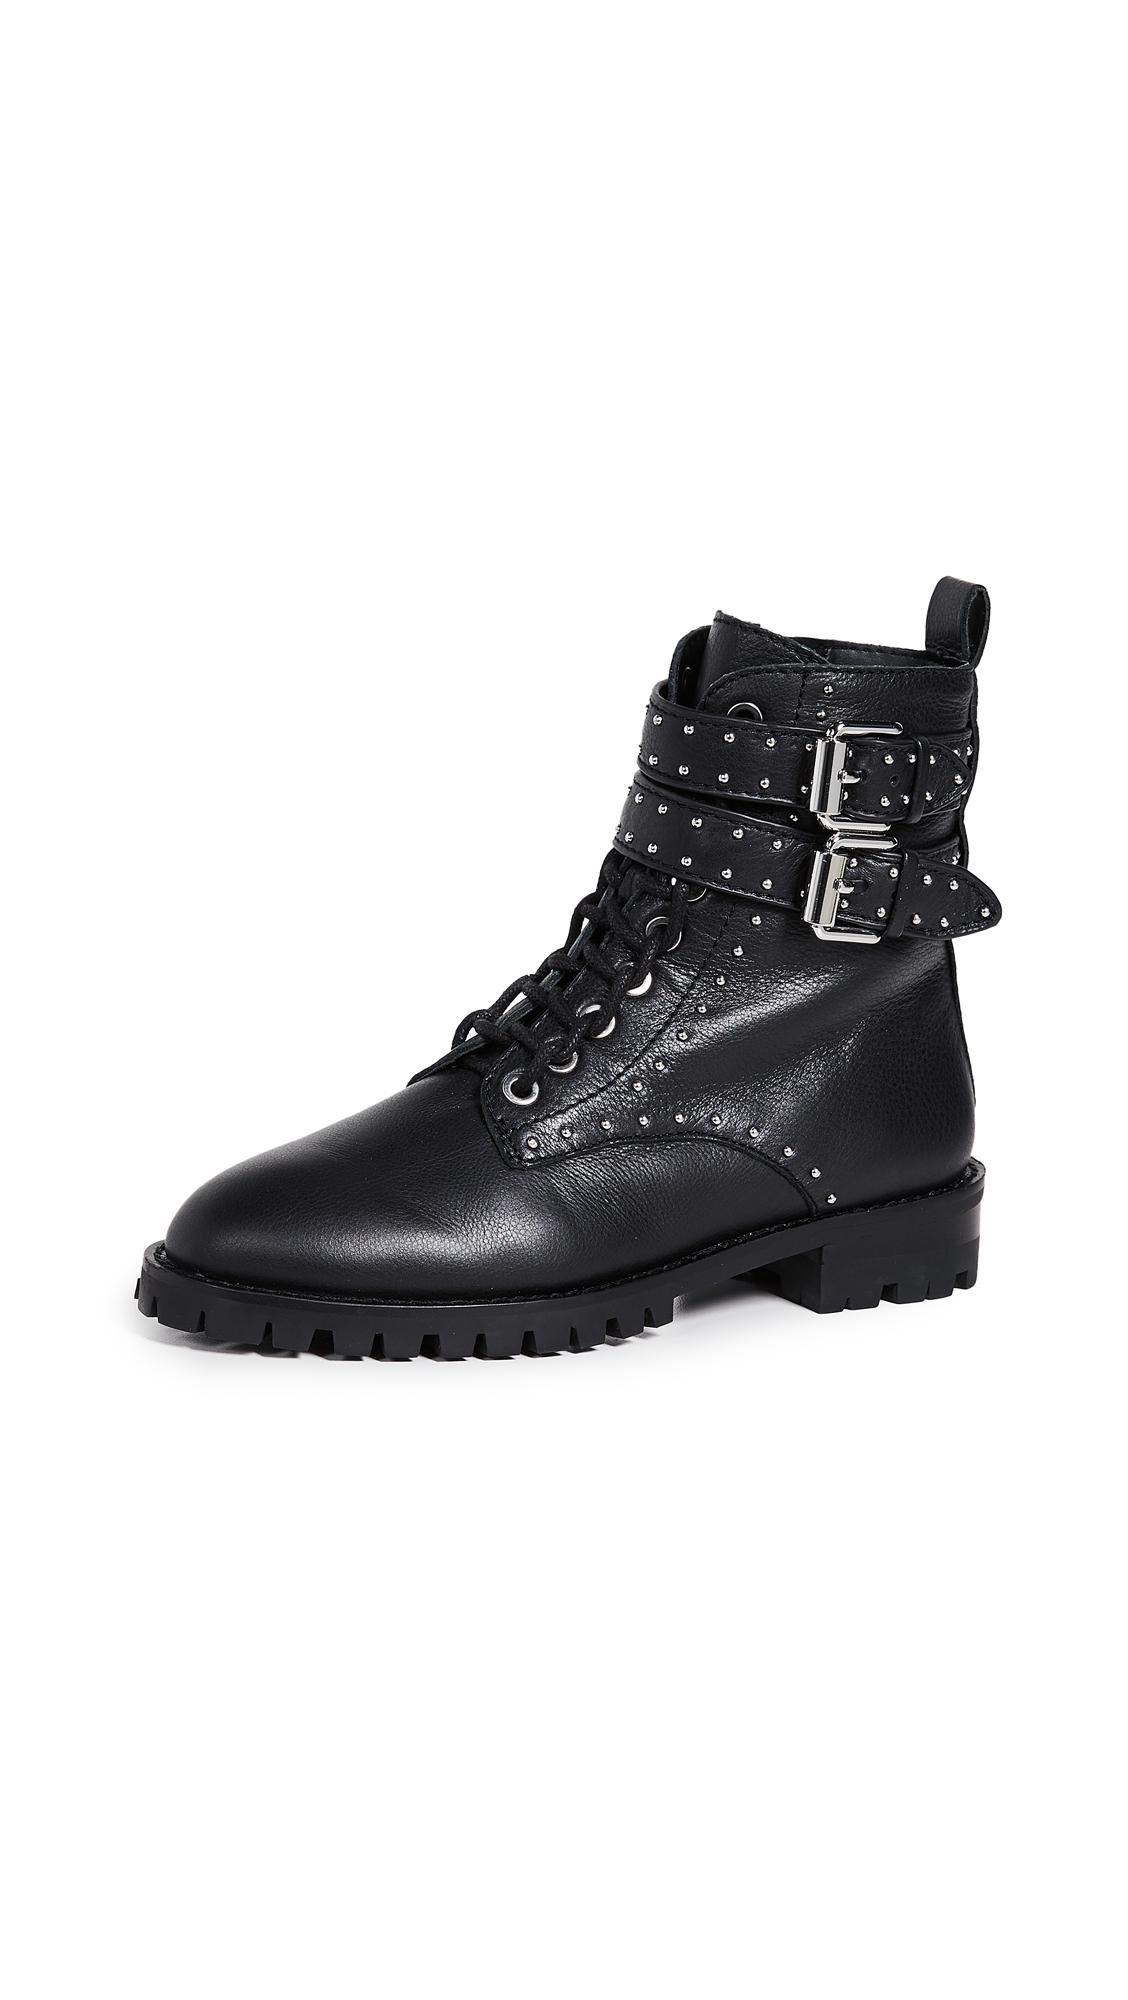 Rebecca Minkoff Jaiden Stud Combat Boots - Black